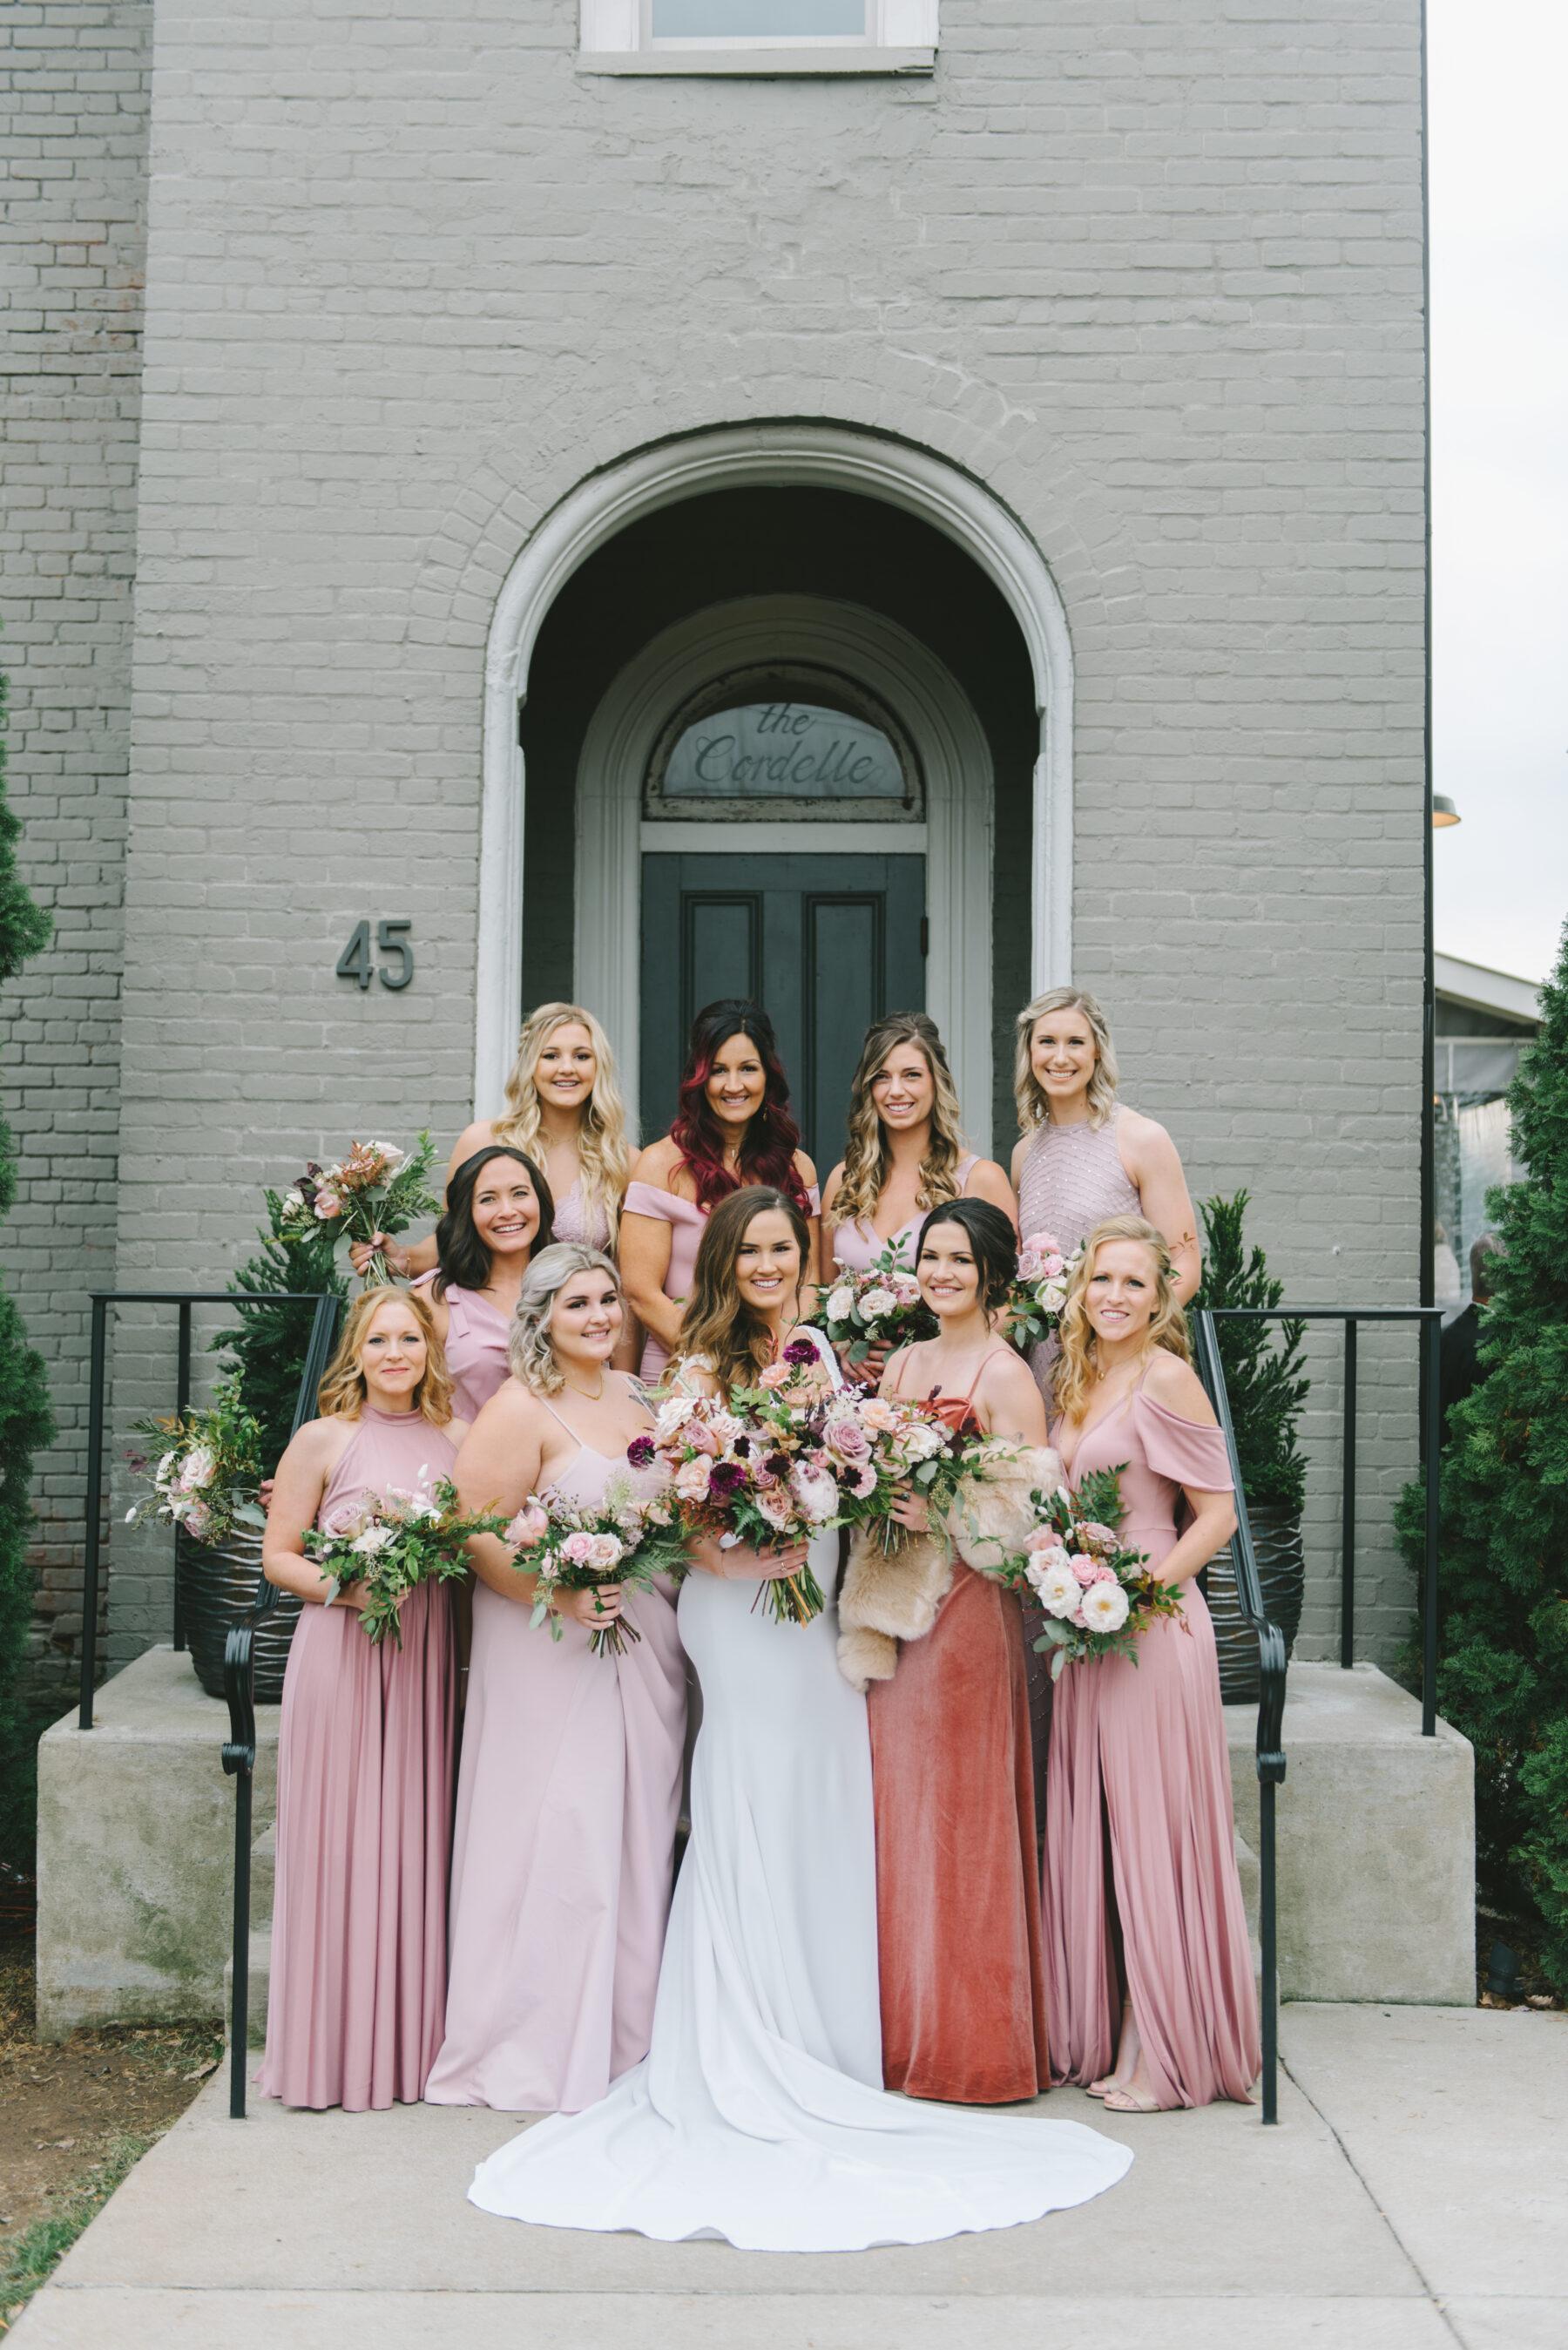 Shades of Pink Bridesmaid Dresses   Nashville Bride Guide